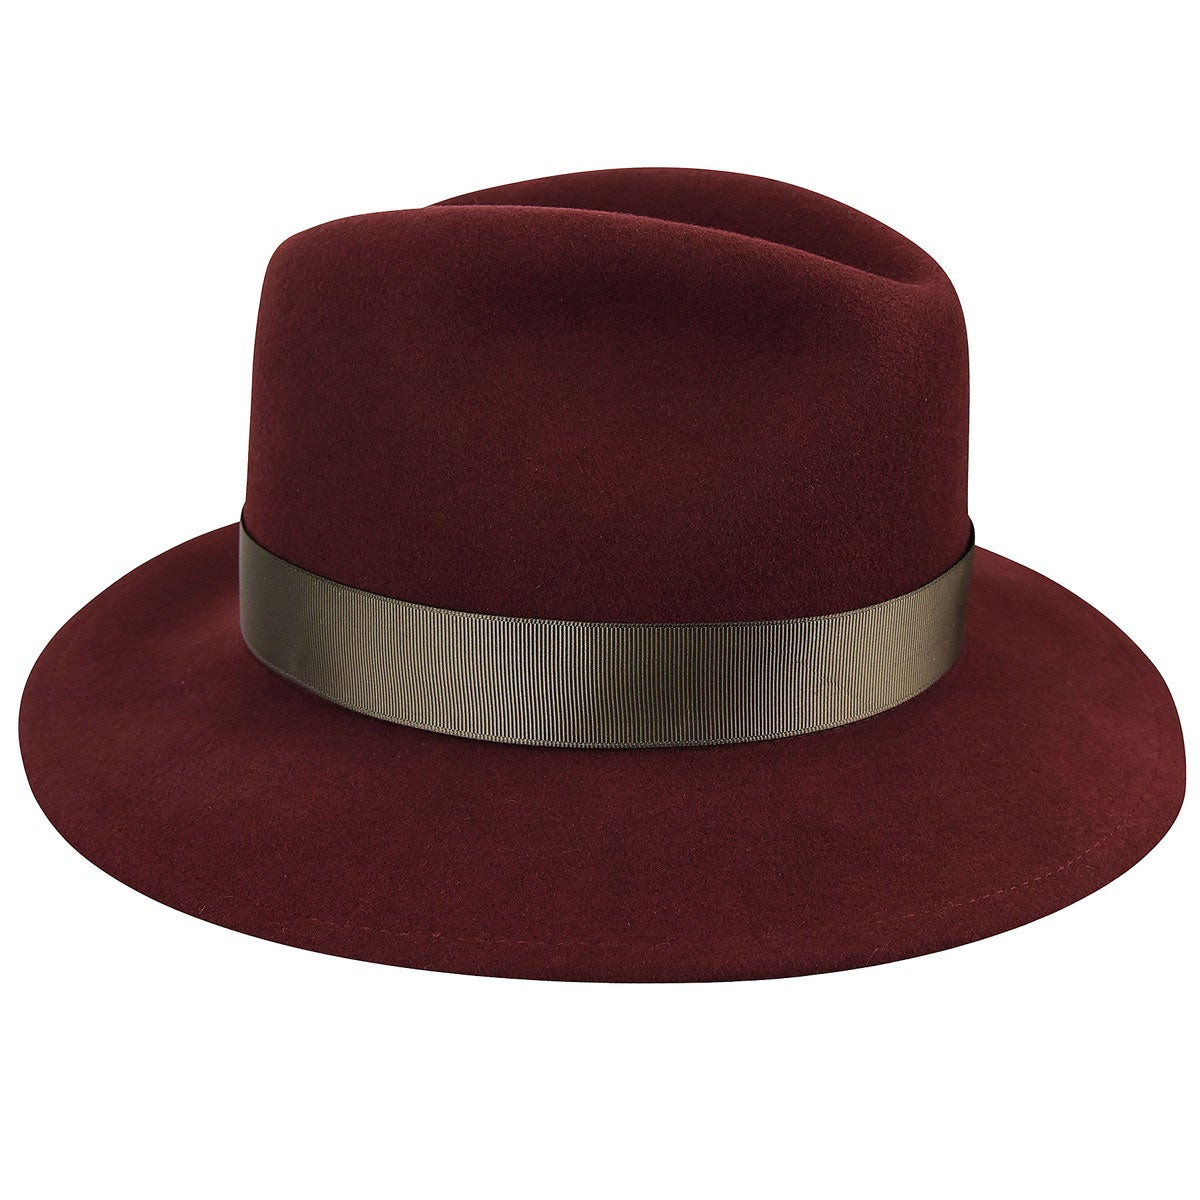 1940s Hats History Sawyer Fedora $93.00 AT vintagedancer.com